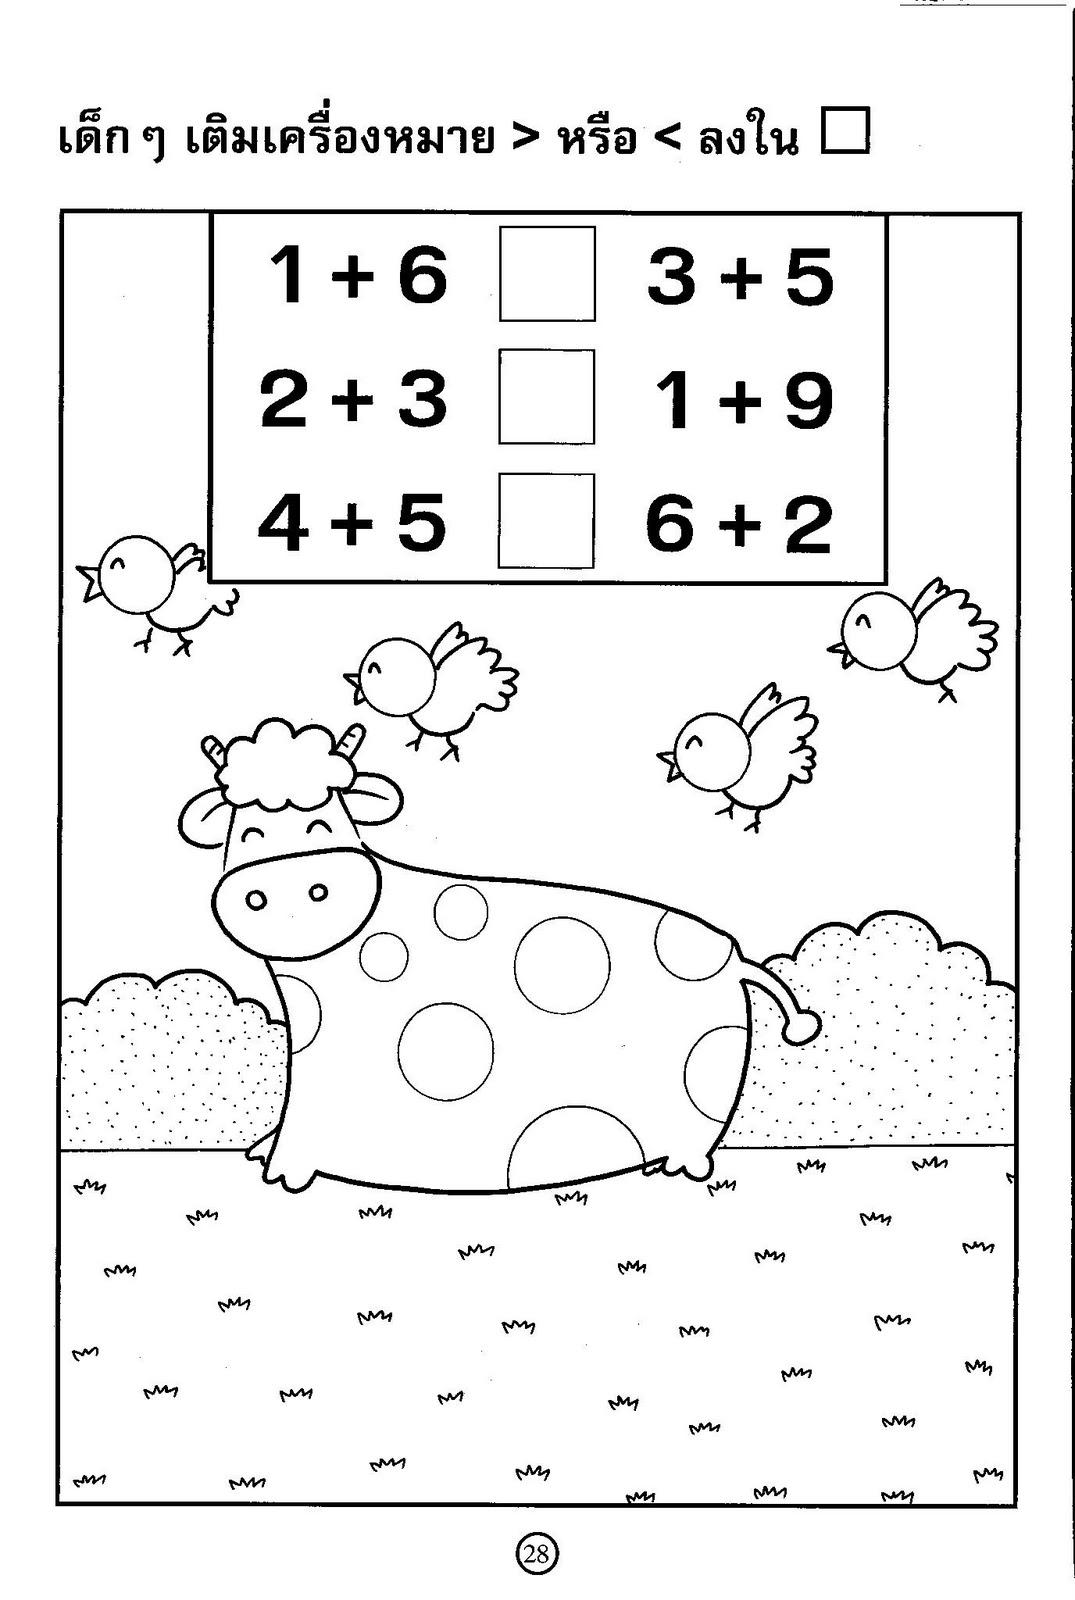 Fun Amp Learn Free Worksheets For Kid แบบฝึกหัดบวกเลข